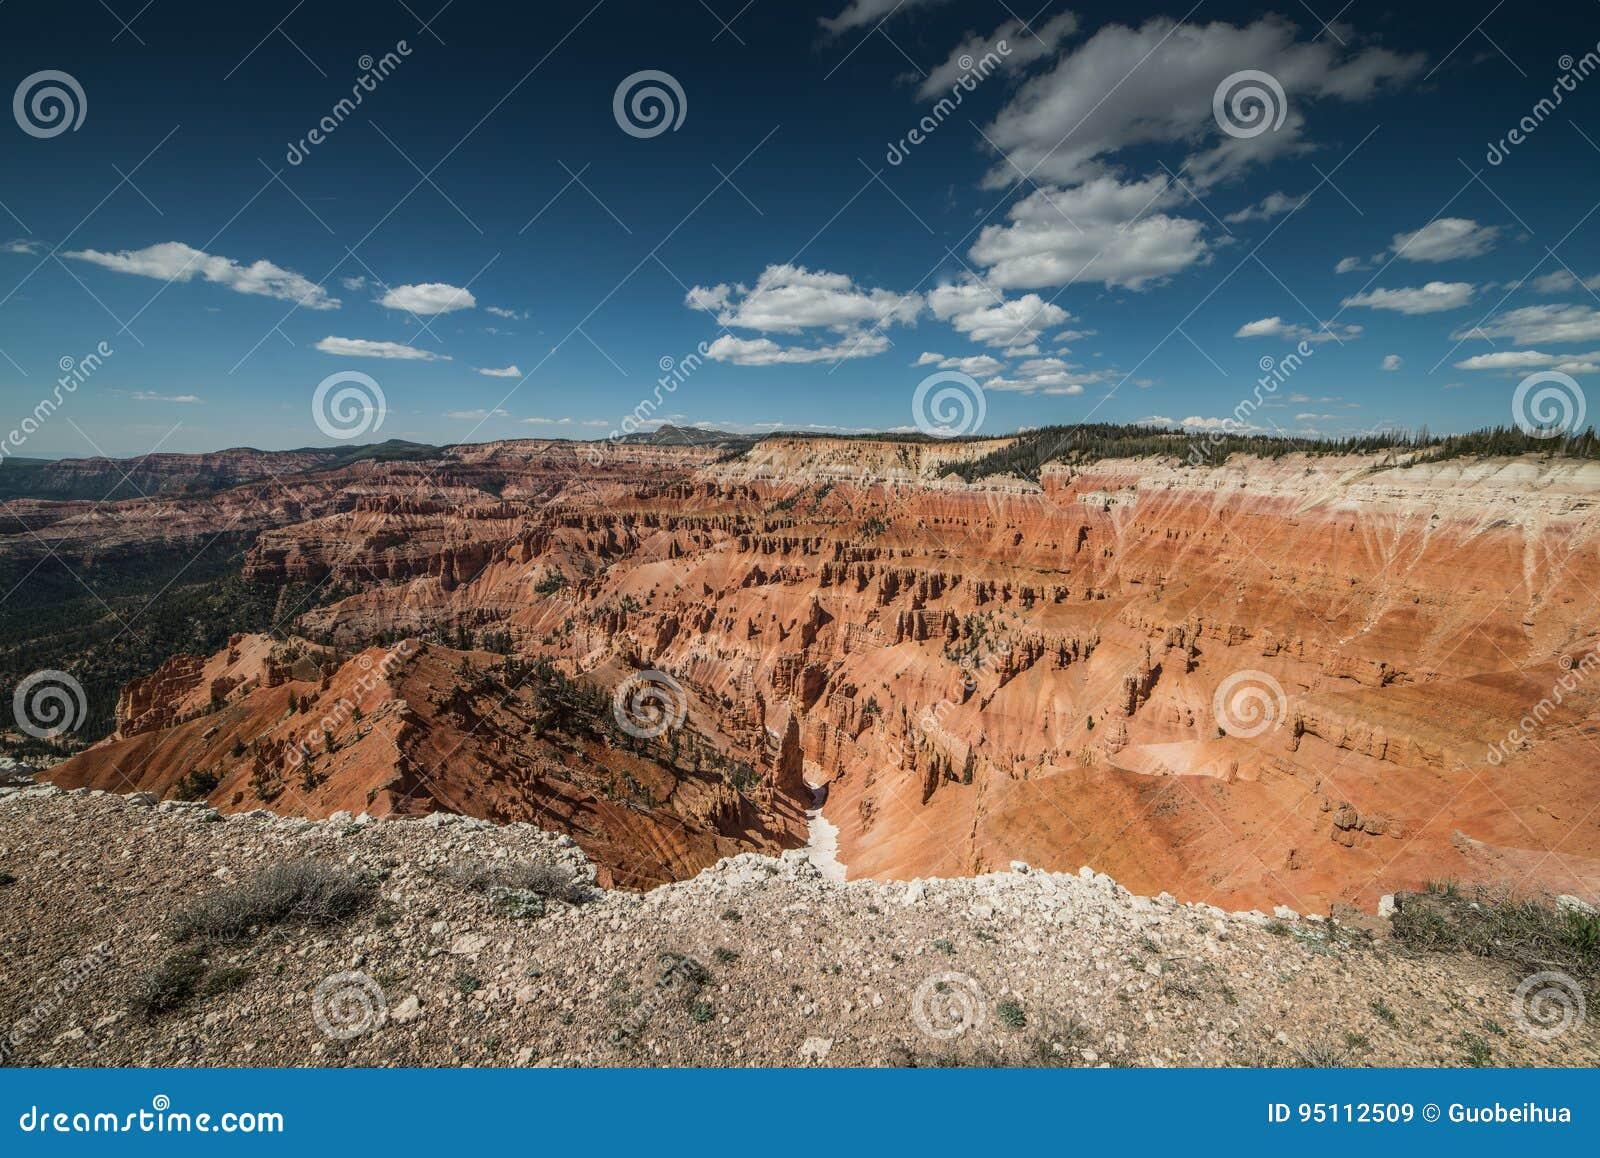 Panorama of Hoodoos Formation From Point Supreme in Cedar Breaks National Monument, Brian Head, Utah